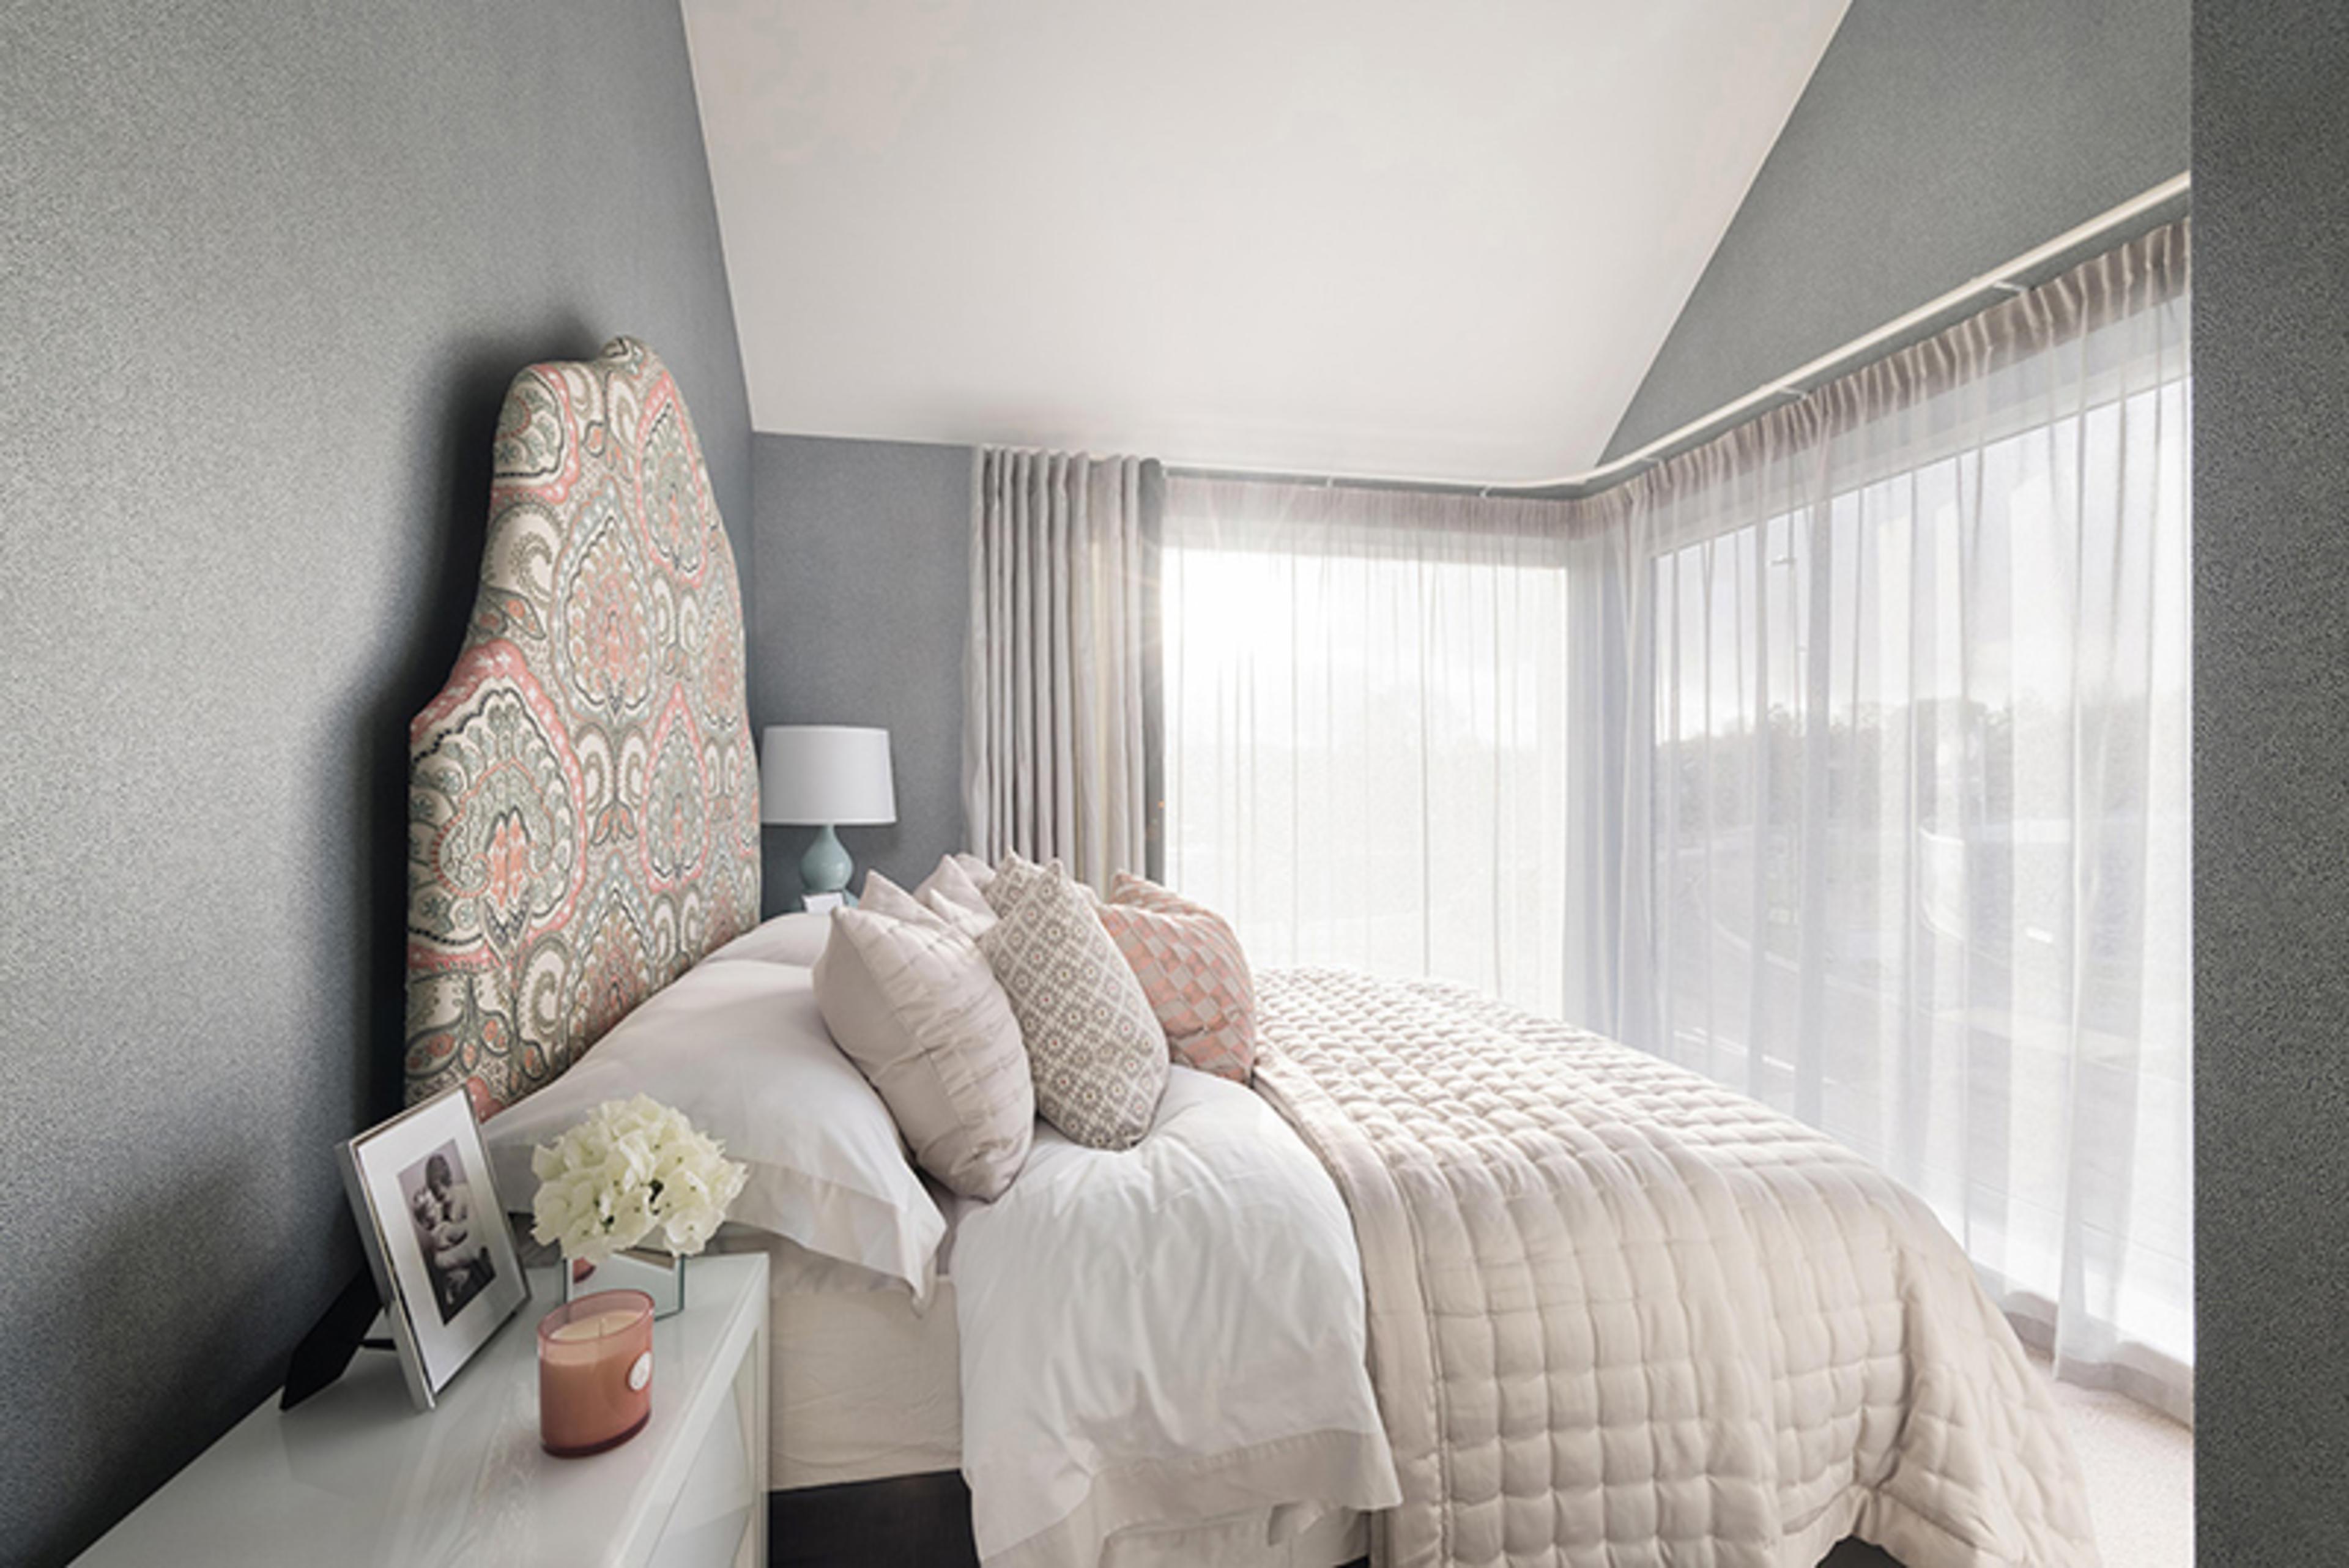 watling-grange-harrogate-calder-3-bed-home-master-bedroom-2